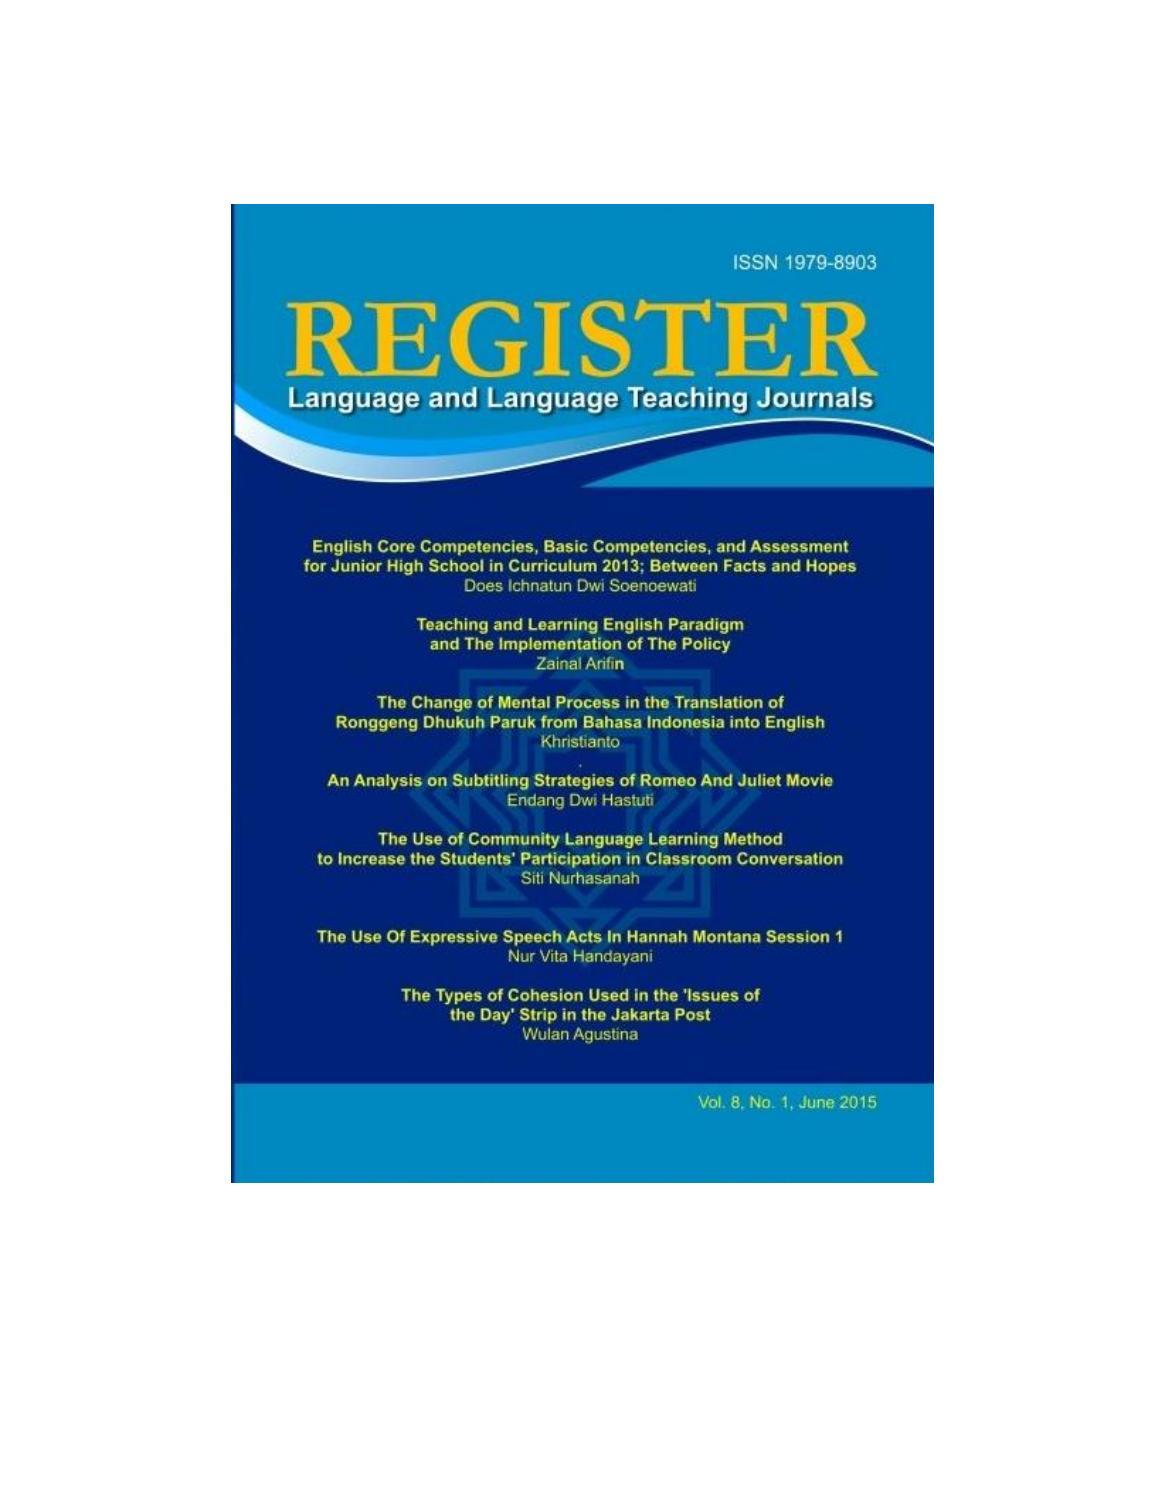 register journal salatiga vol no by fayshol risd issuu